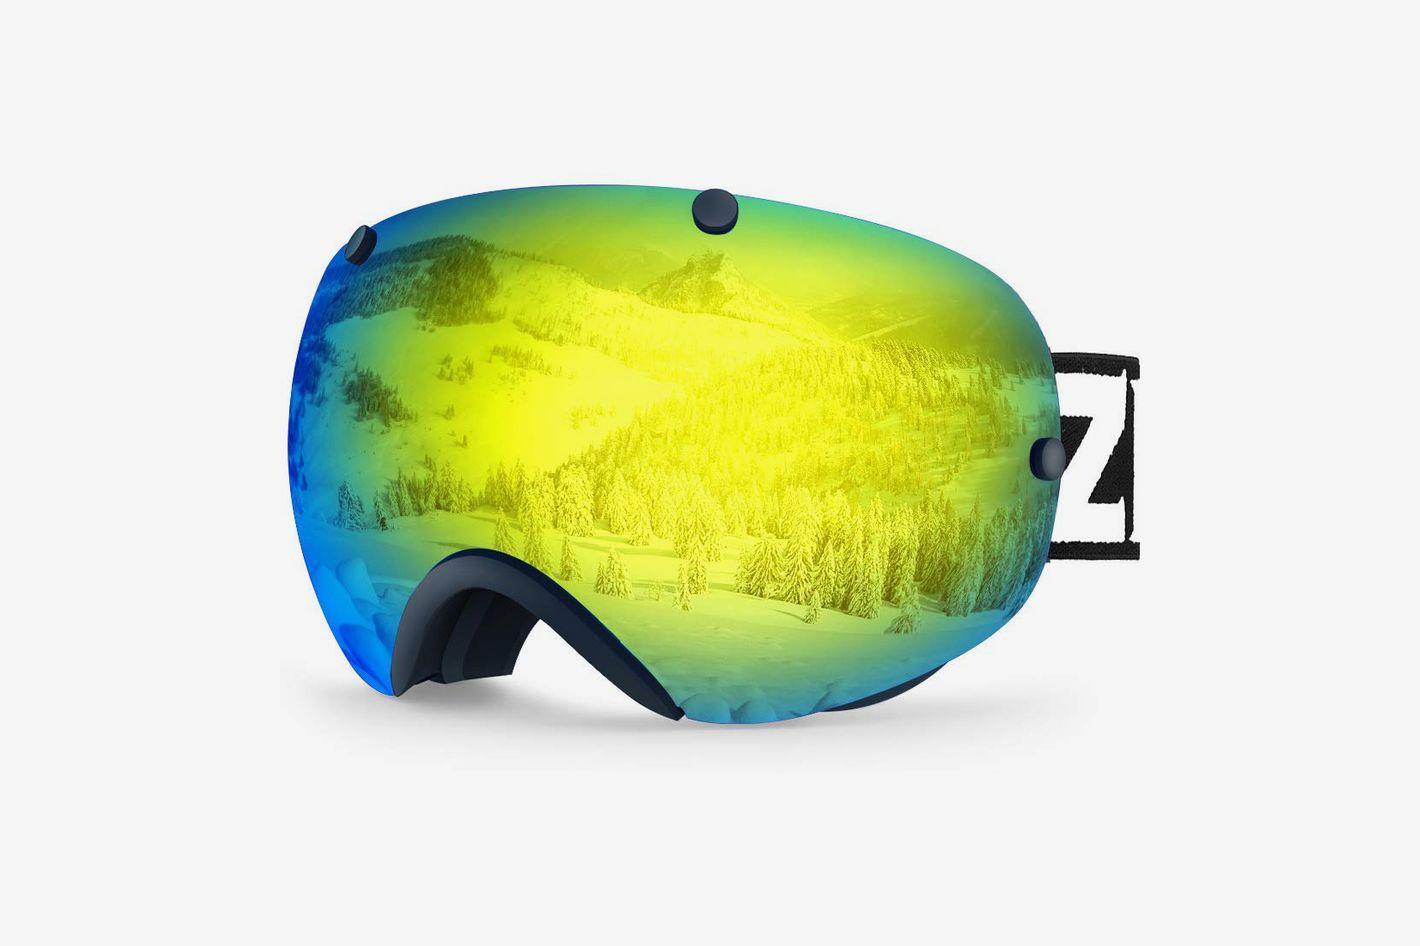 Zionor XA Ski Snowboard